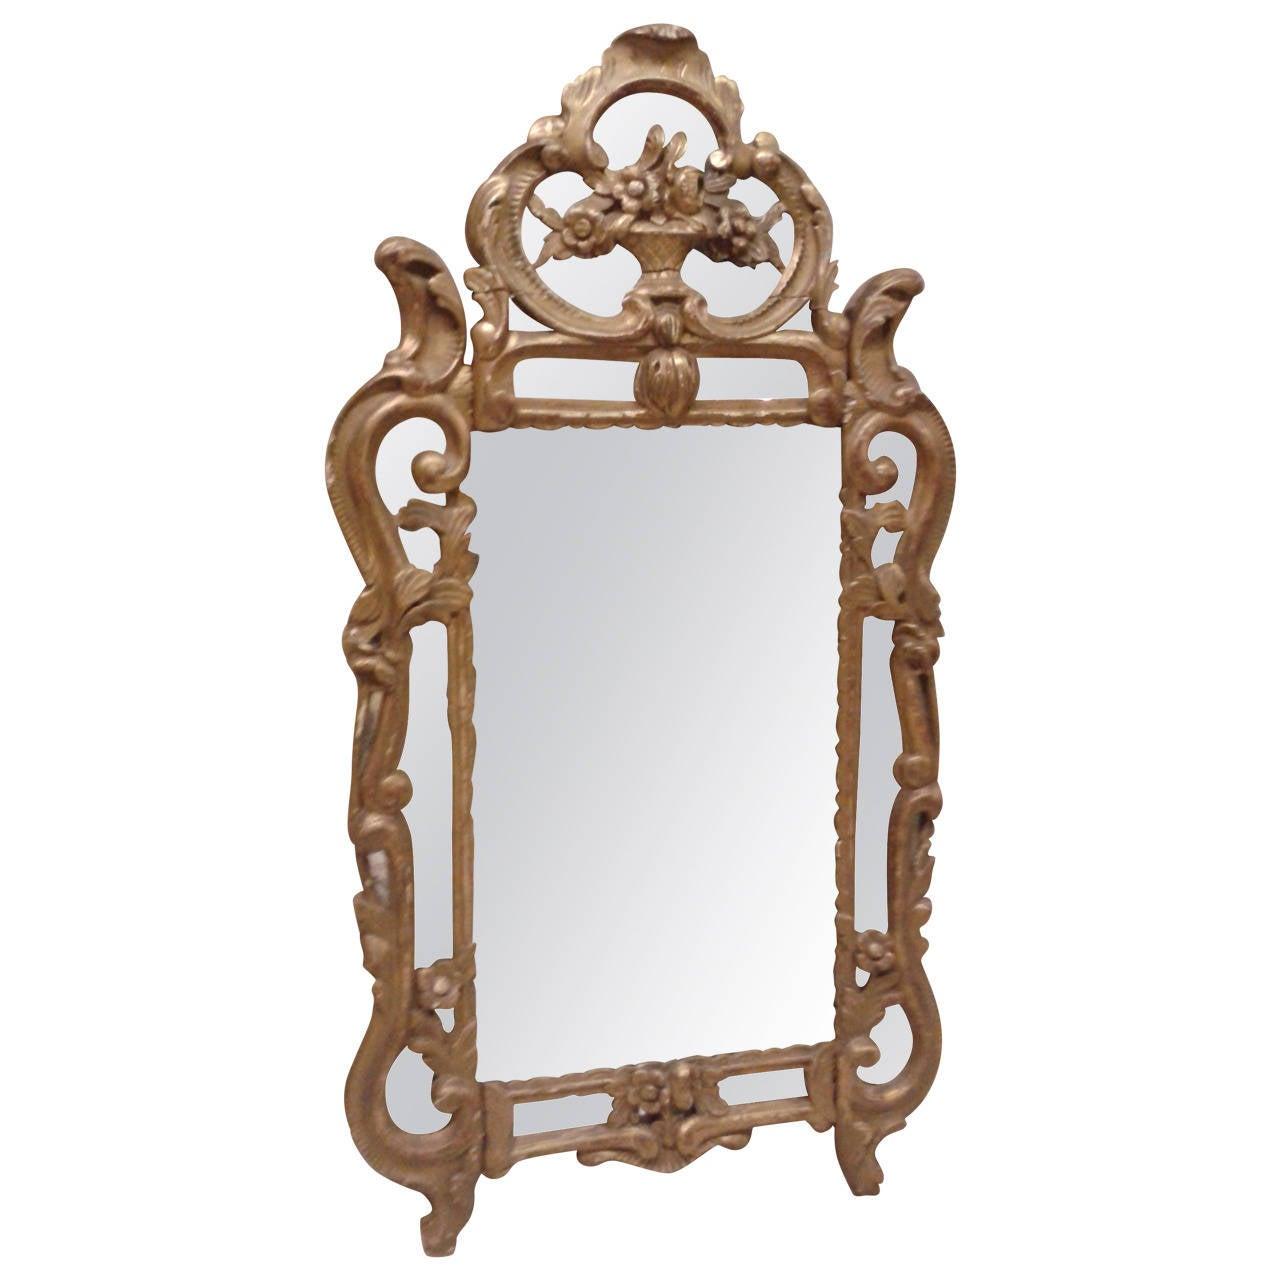 19th Century, French Provençal  Mirror